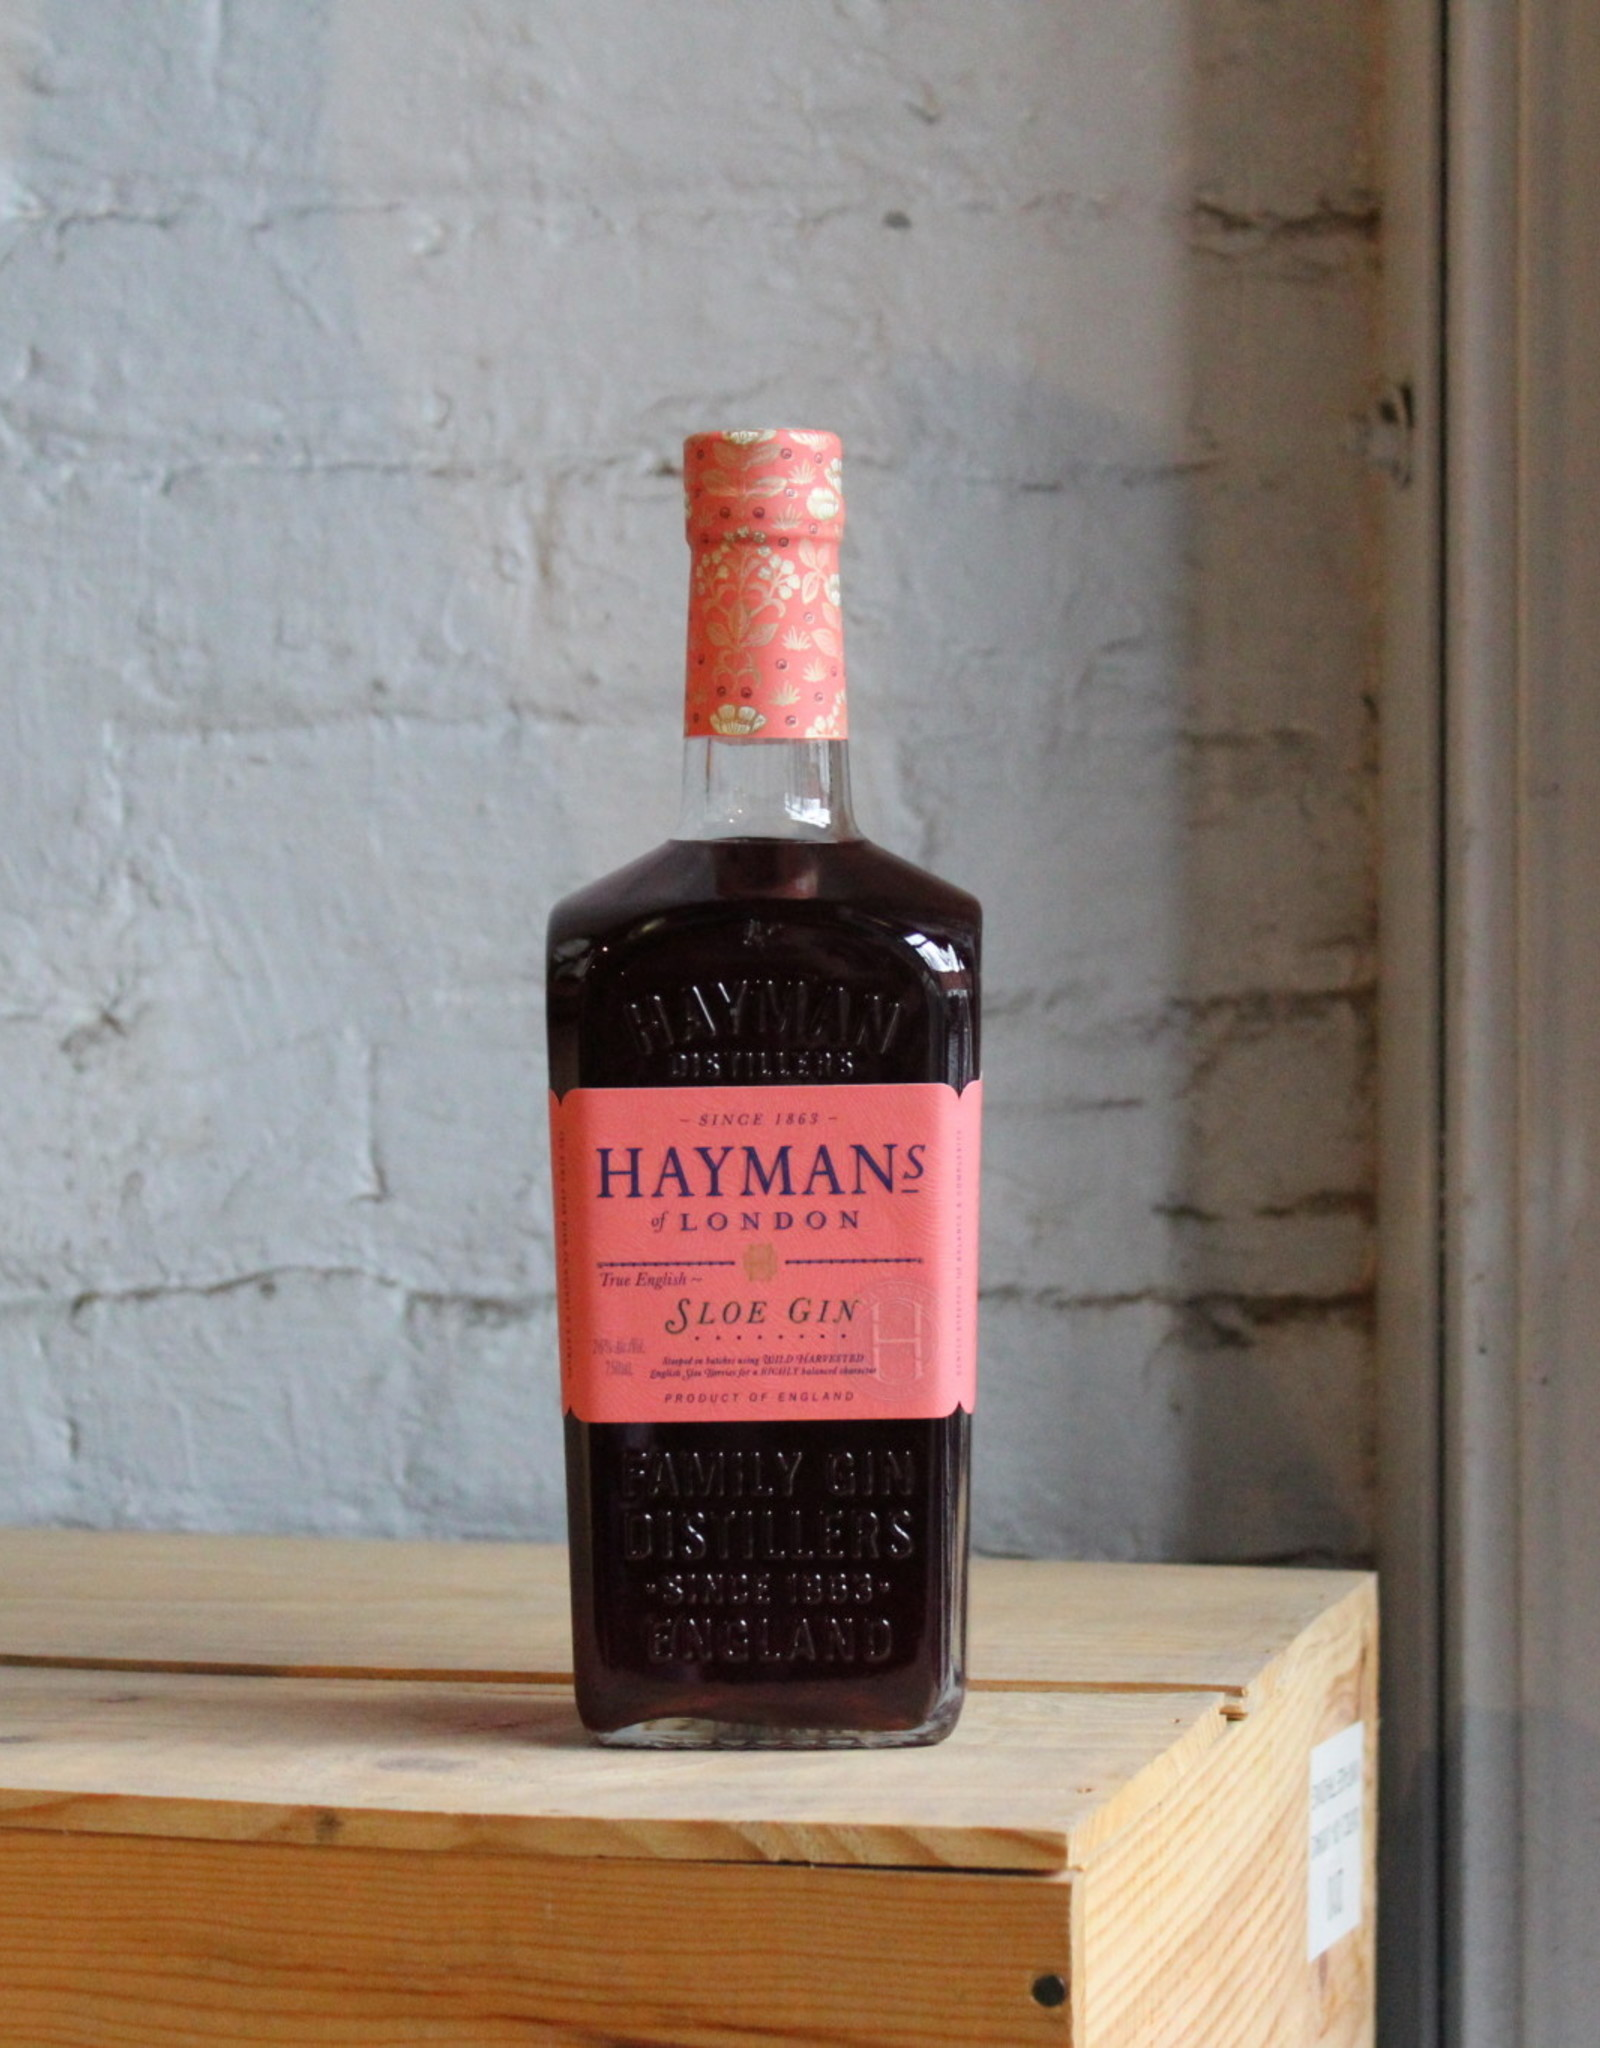 Hayman's Sloe Gin - London, England (750ml)